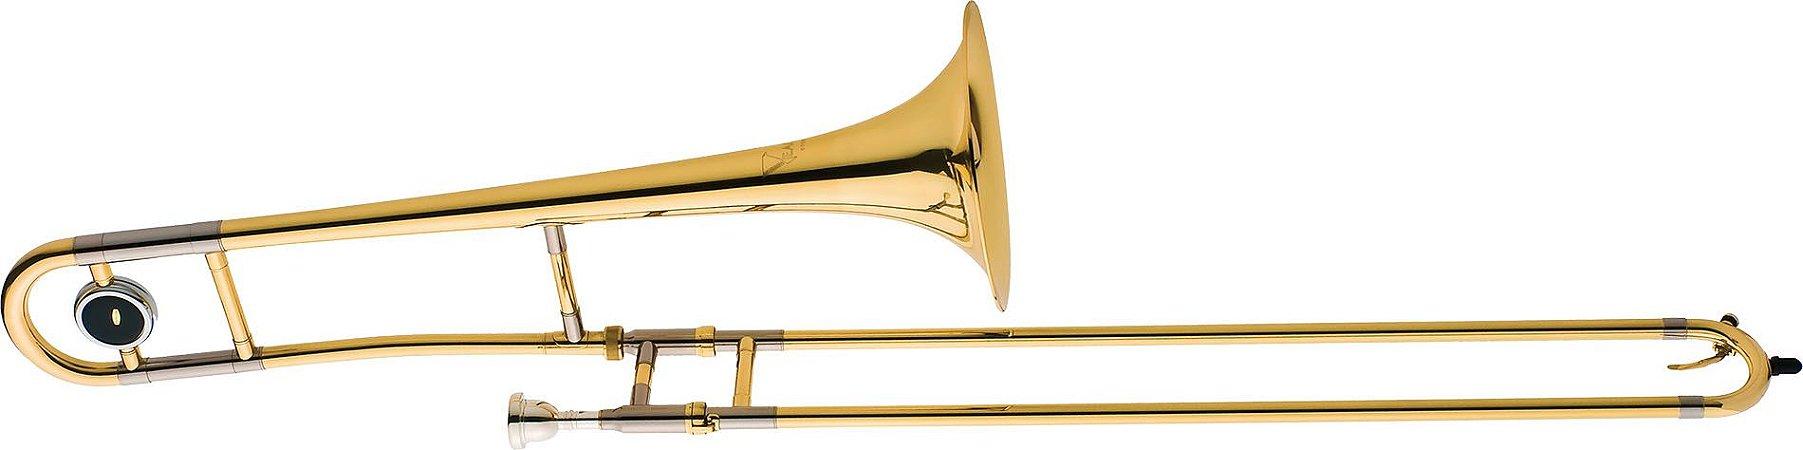 Trombone Vara Eagle TV-600